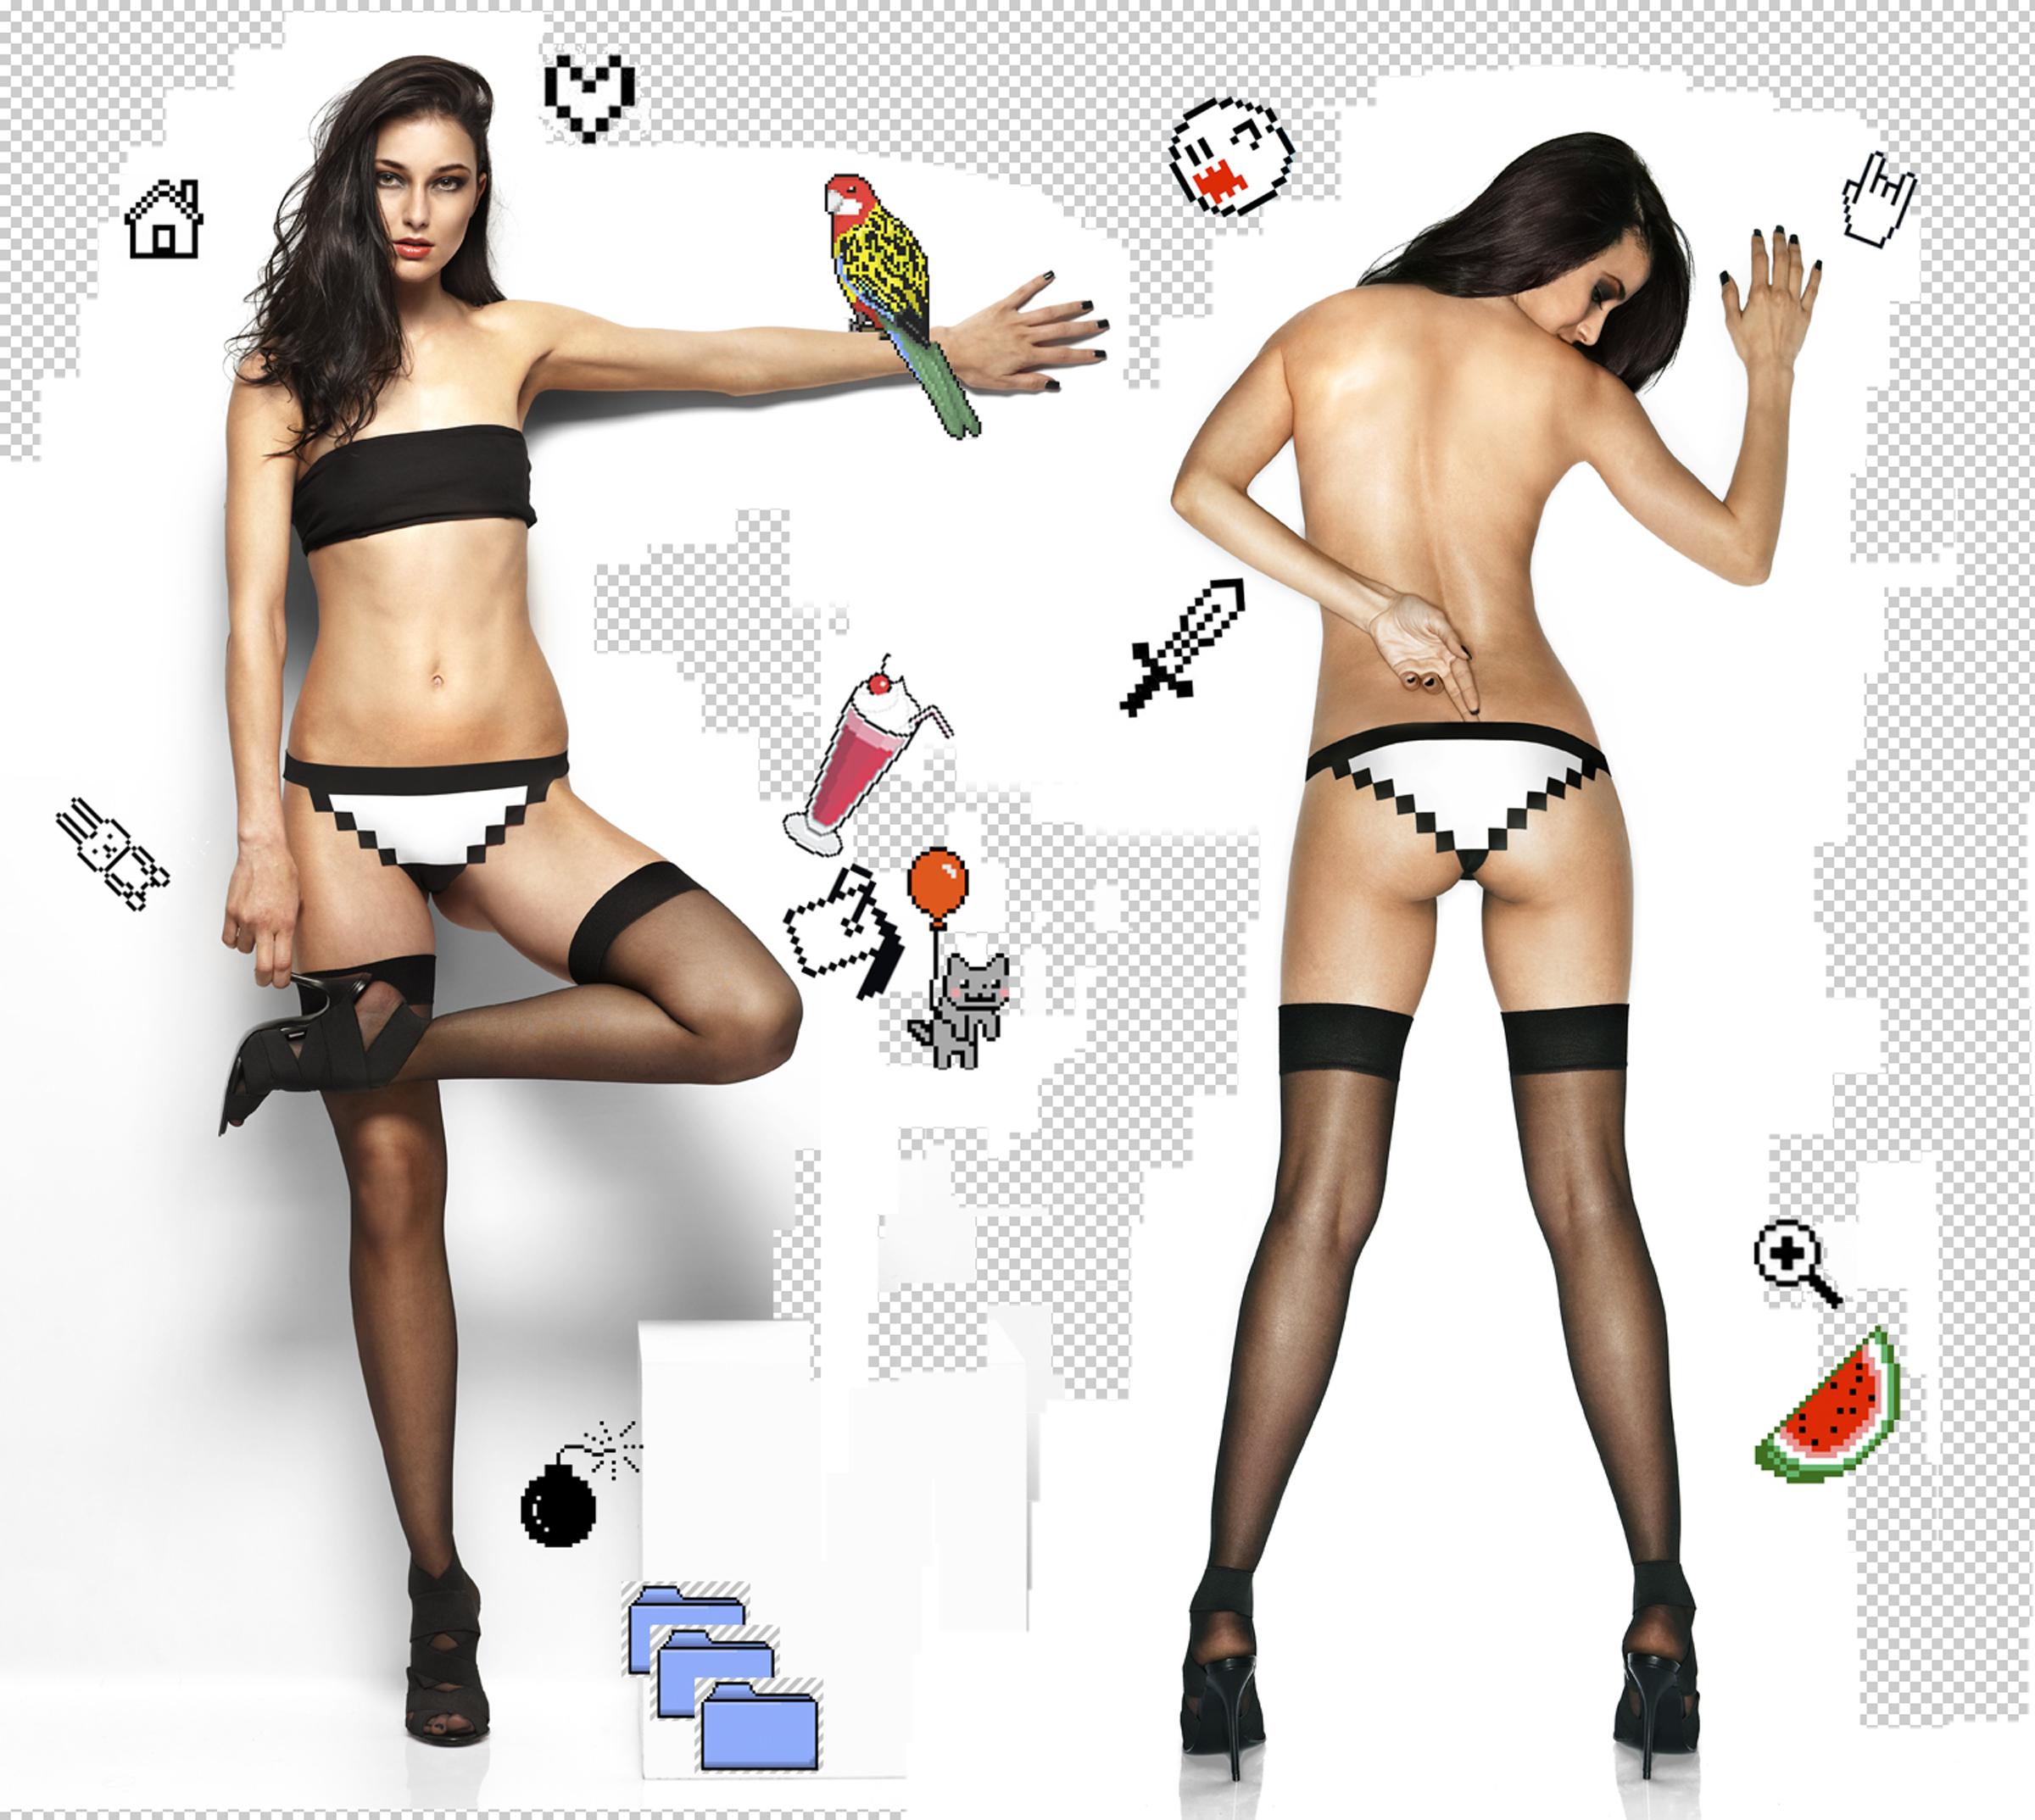 pixel panties. world's first 8-bit underwear.